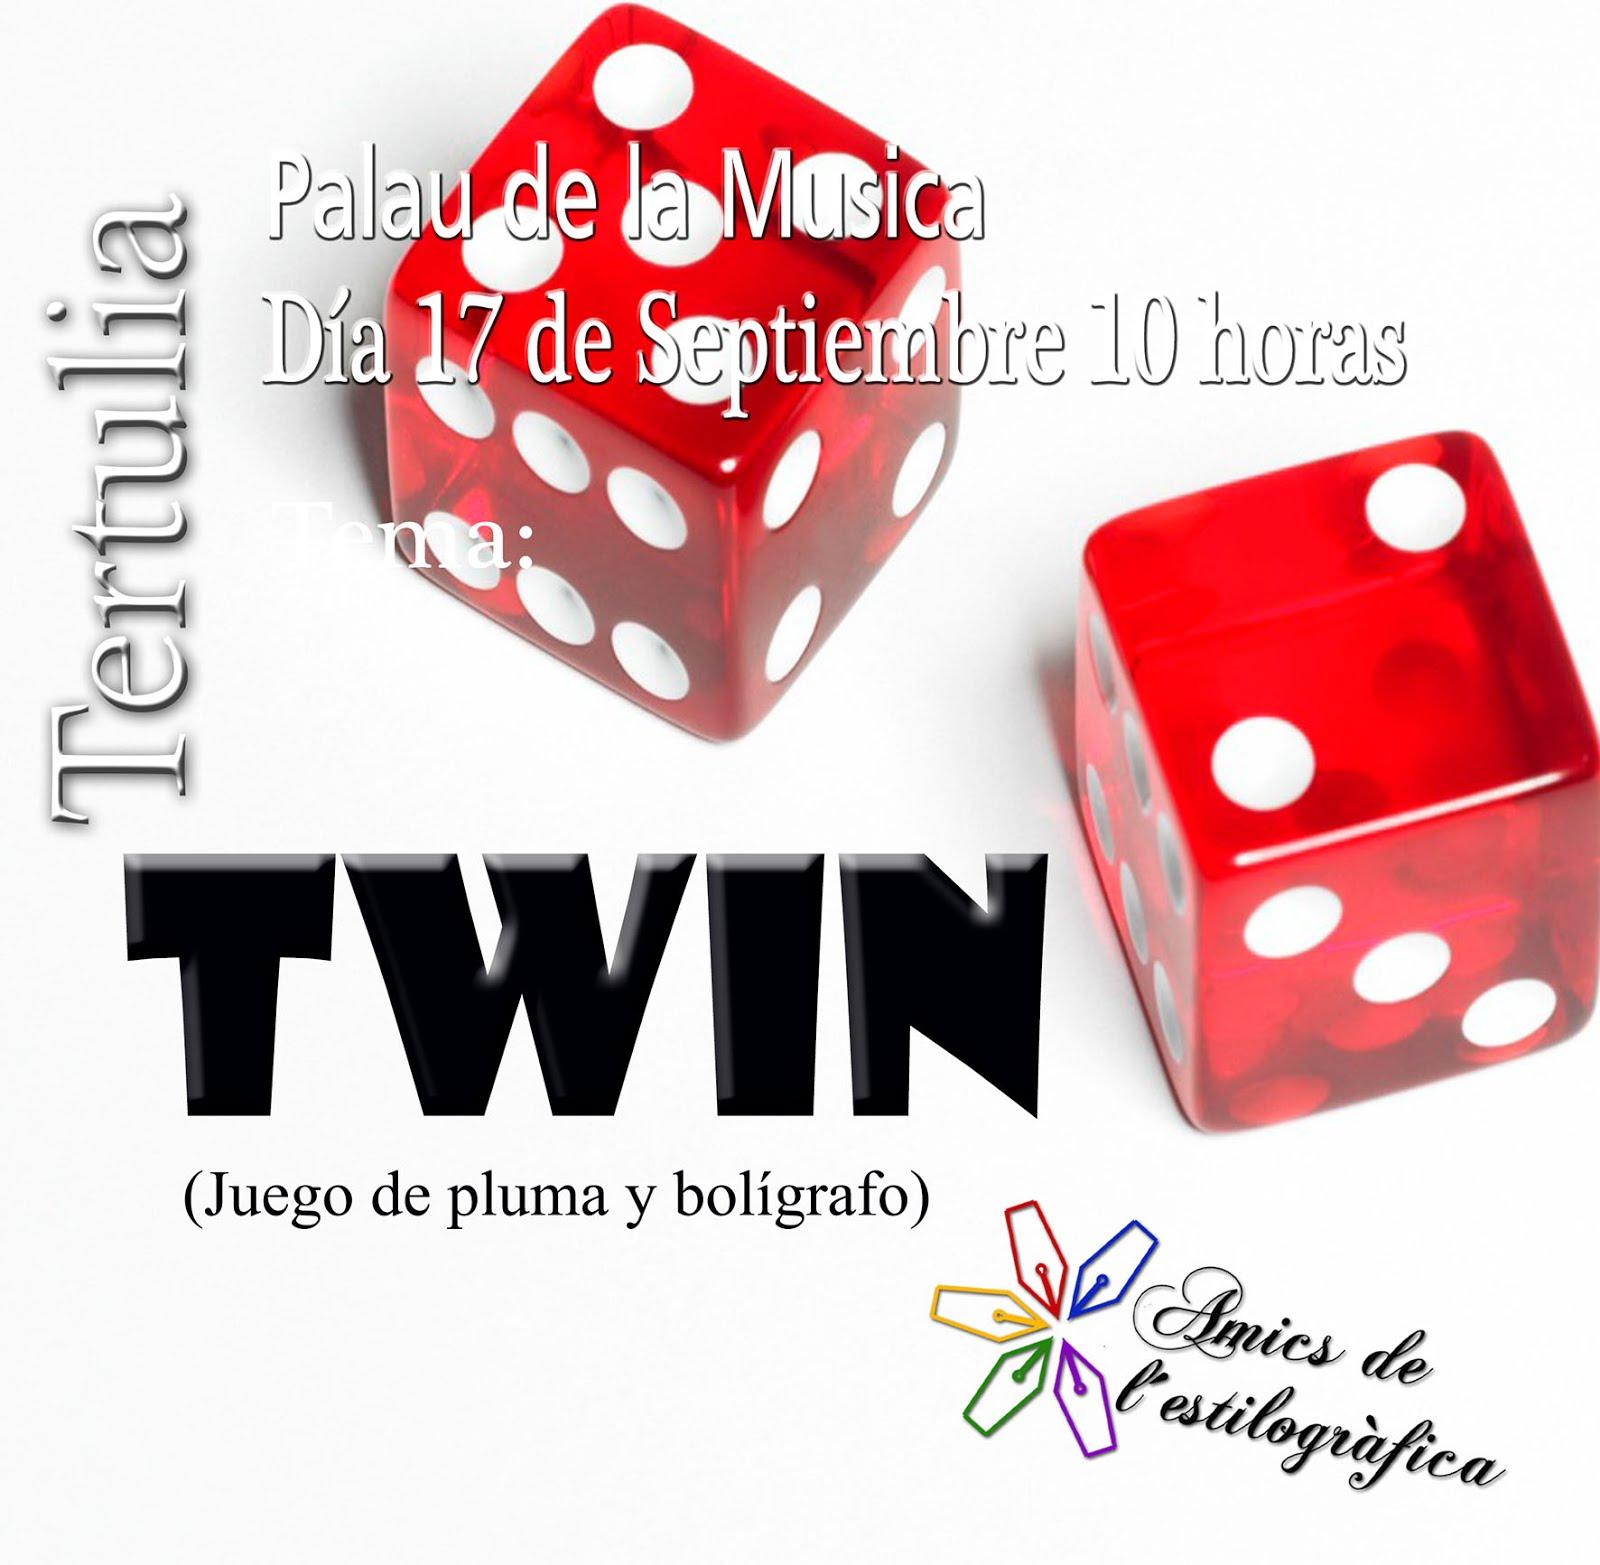 46 TERTULIA 17 DE SEPTIEMBRE (TWIN)